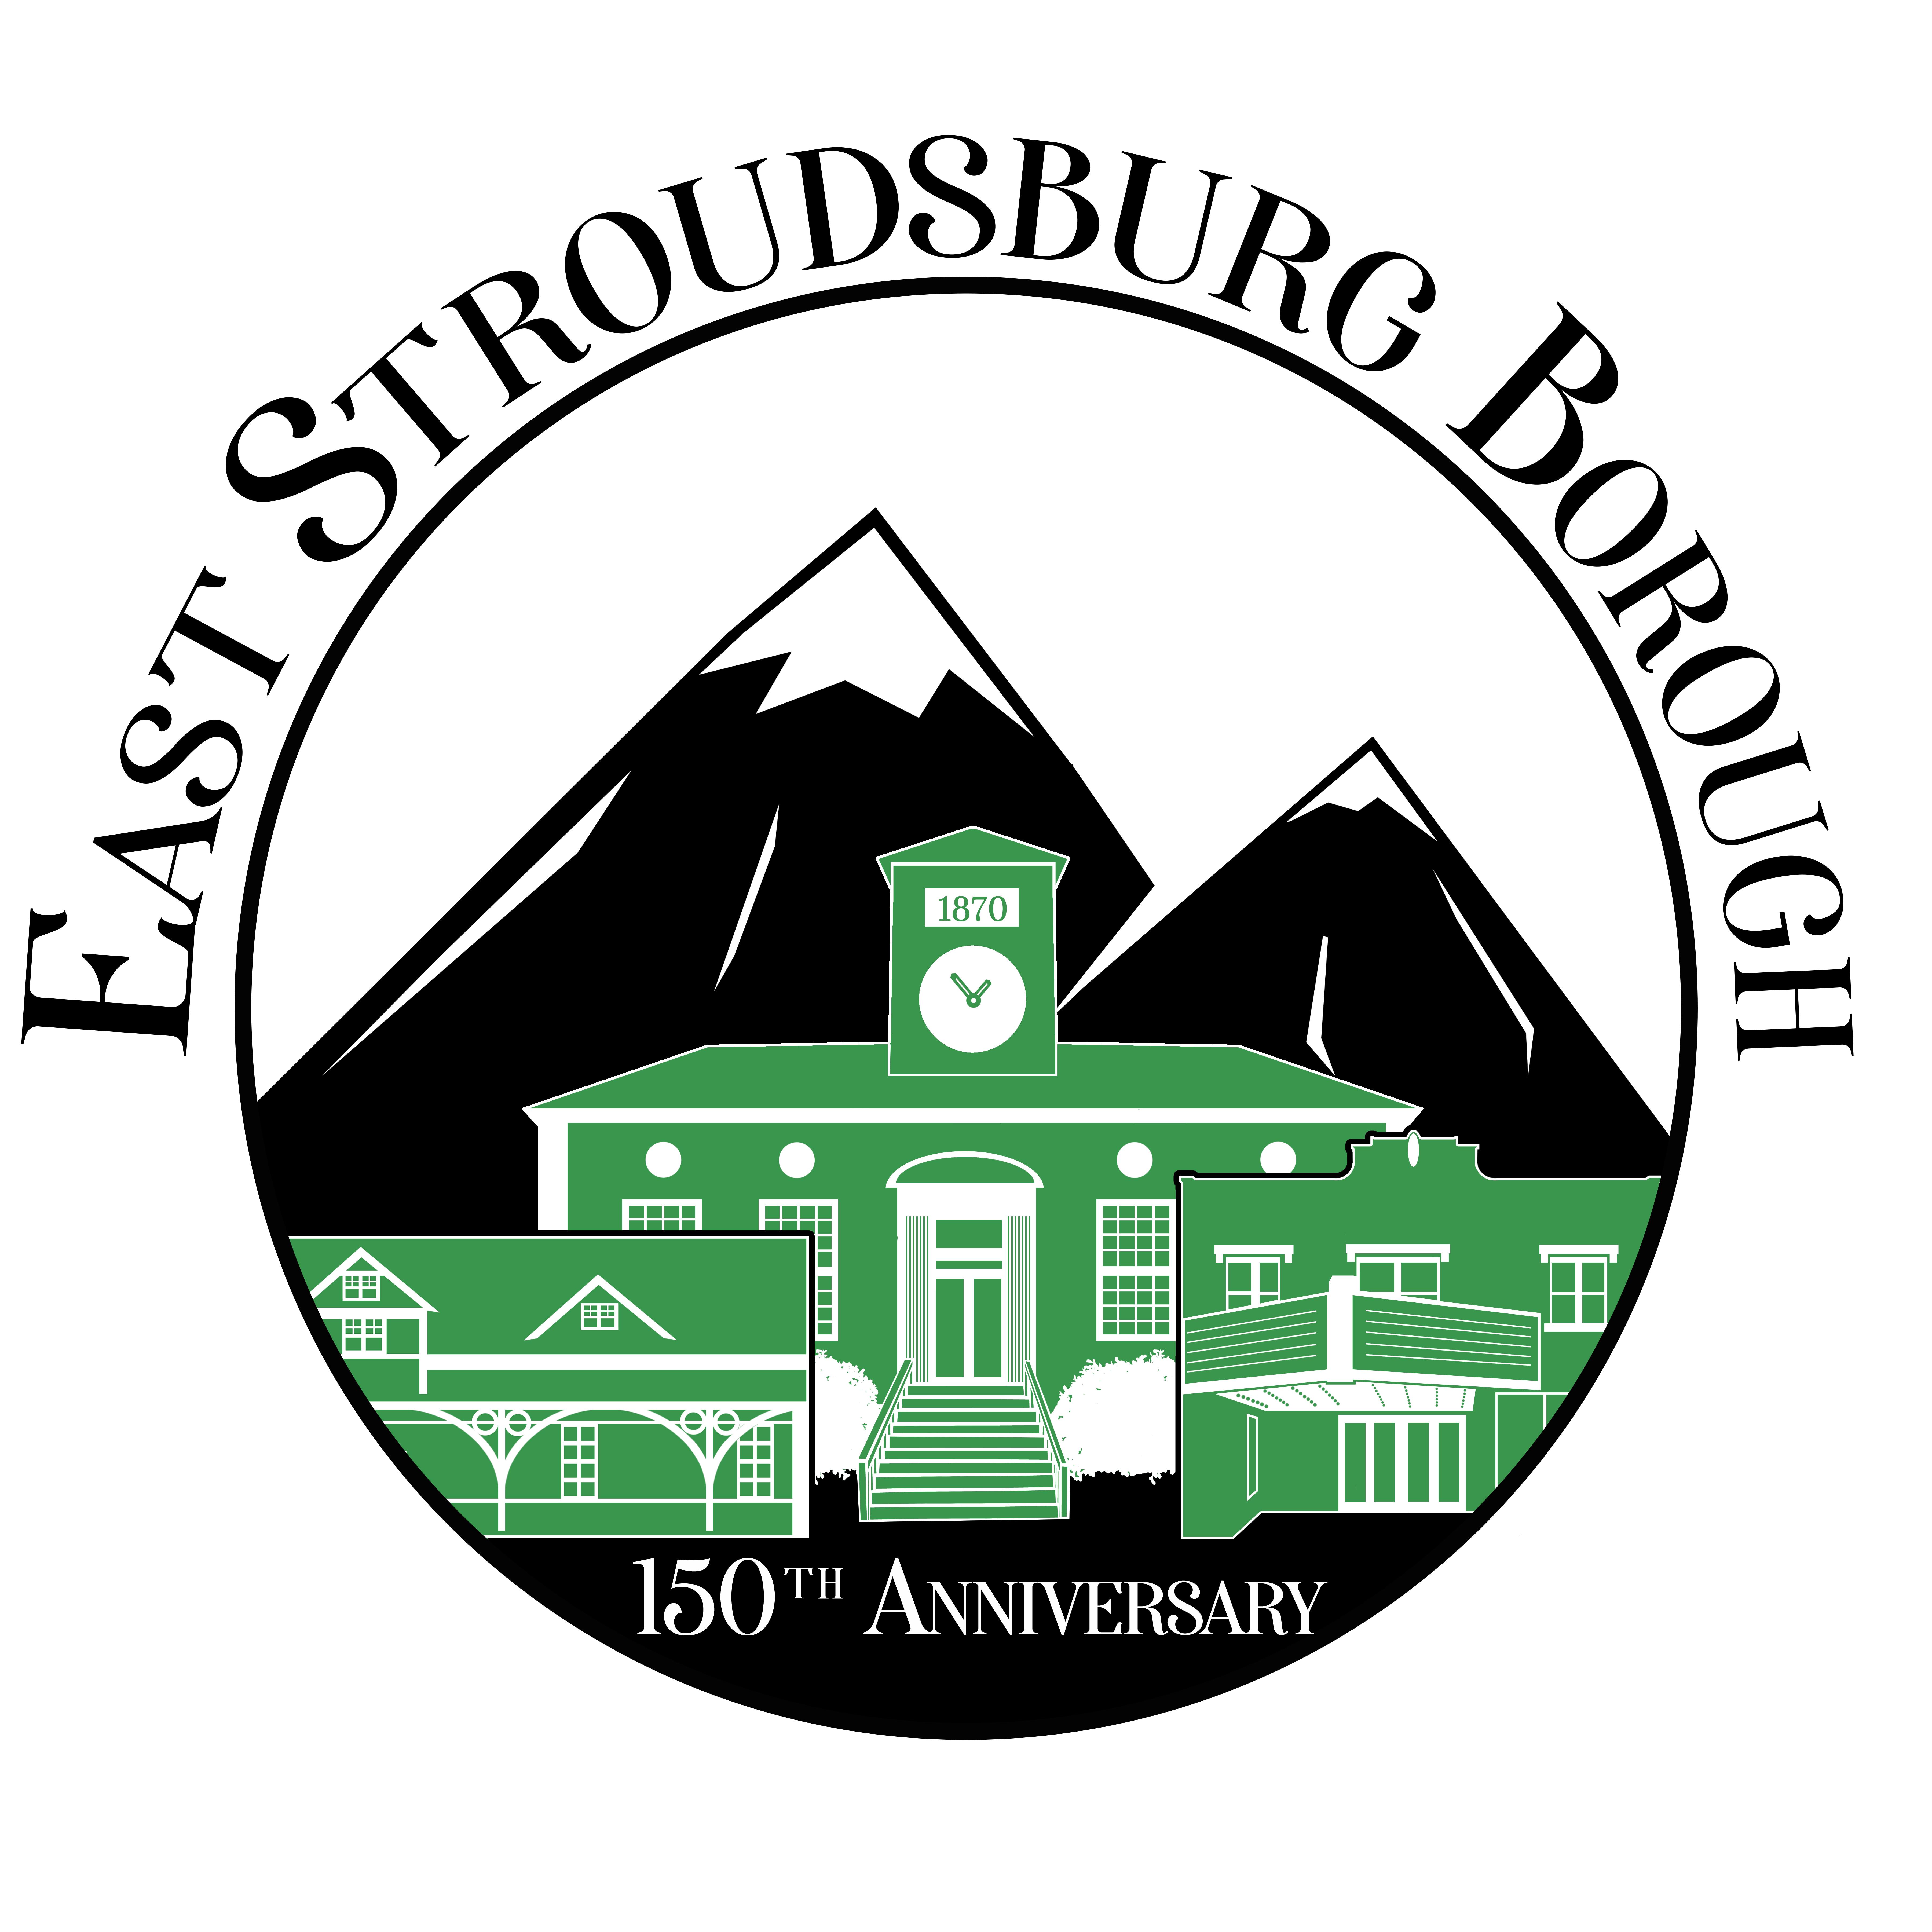 East Stroudsburg Borough 150th Anniversary Logo